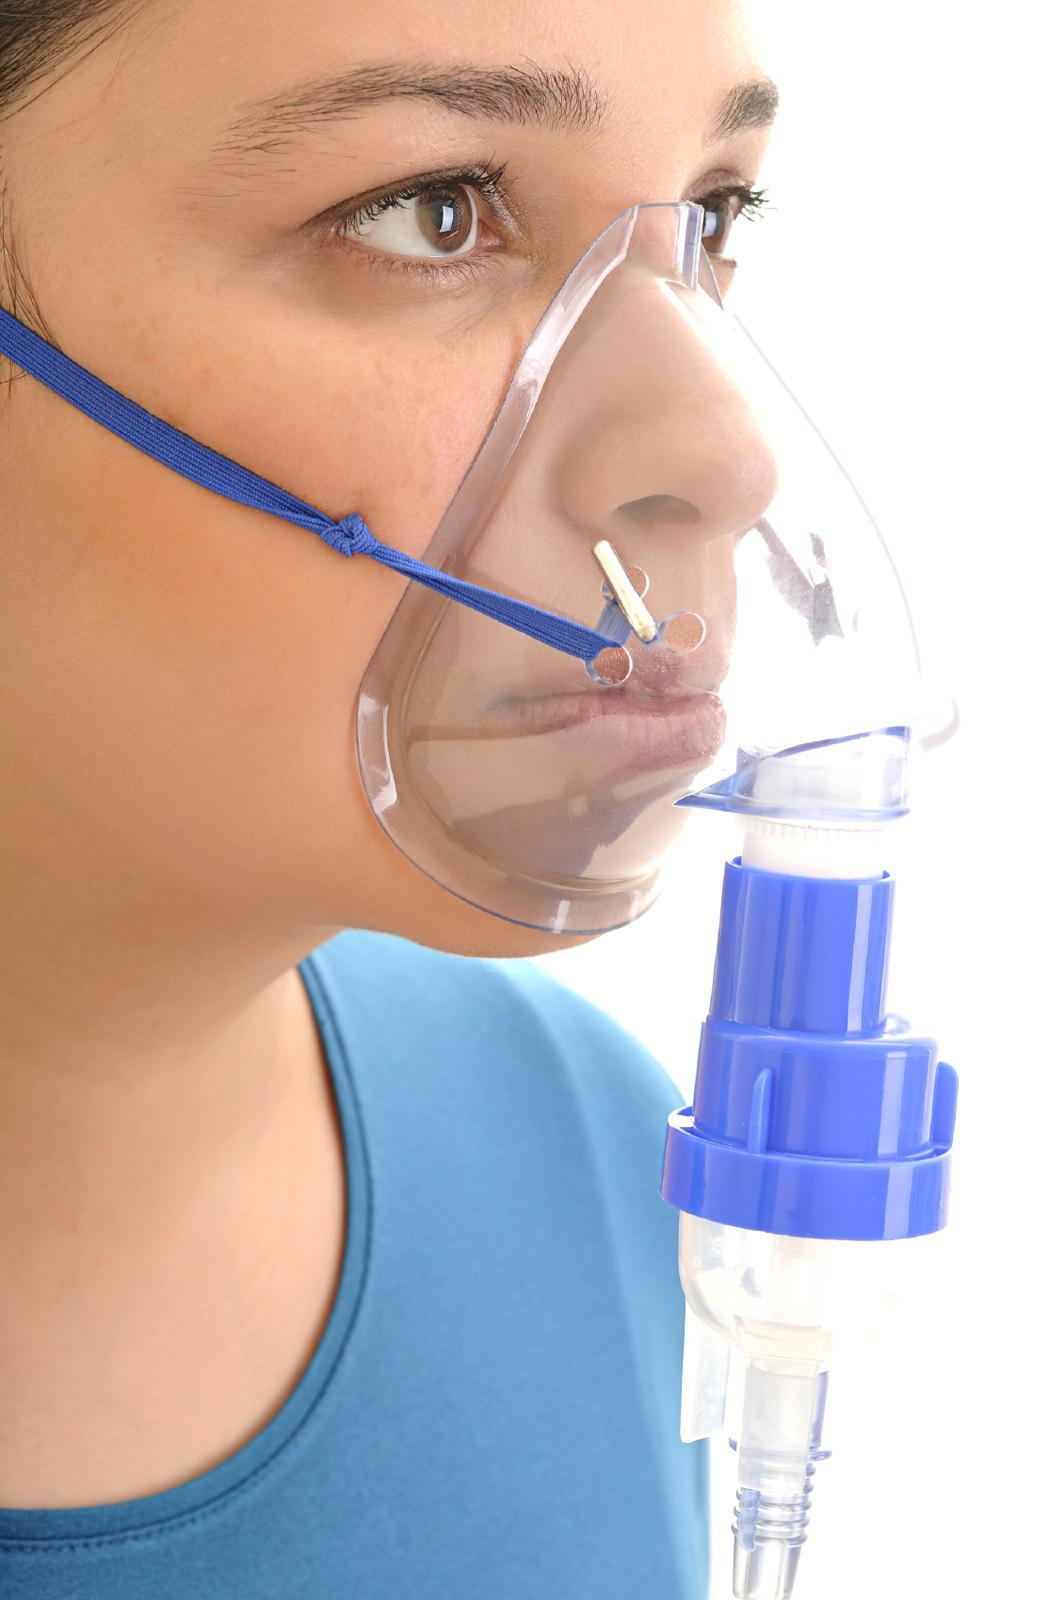 Asthma-Inhaler-000019596136_Medium